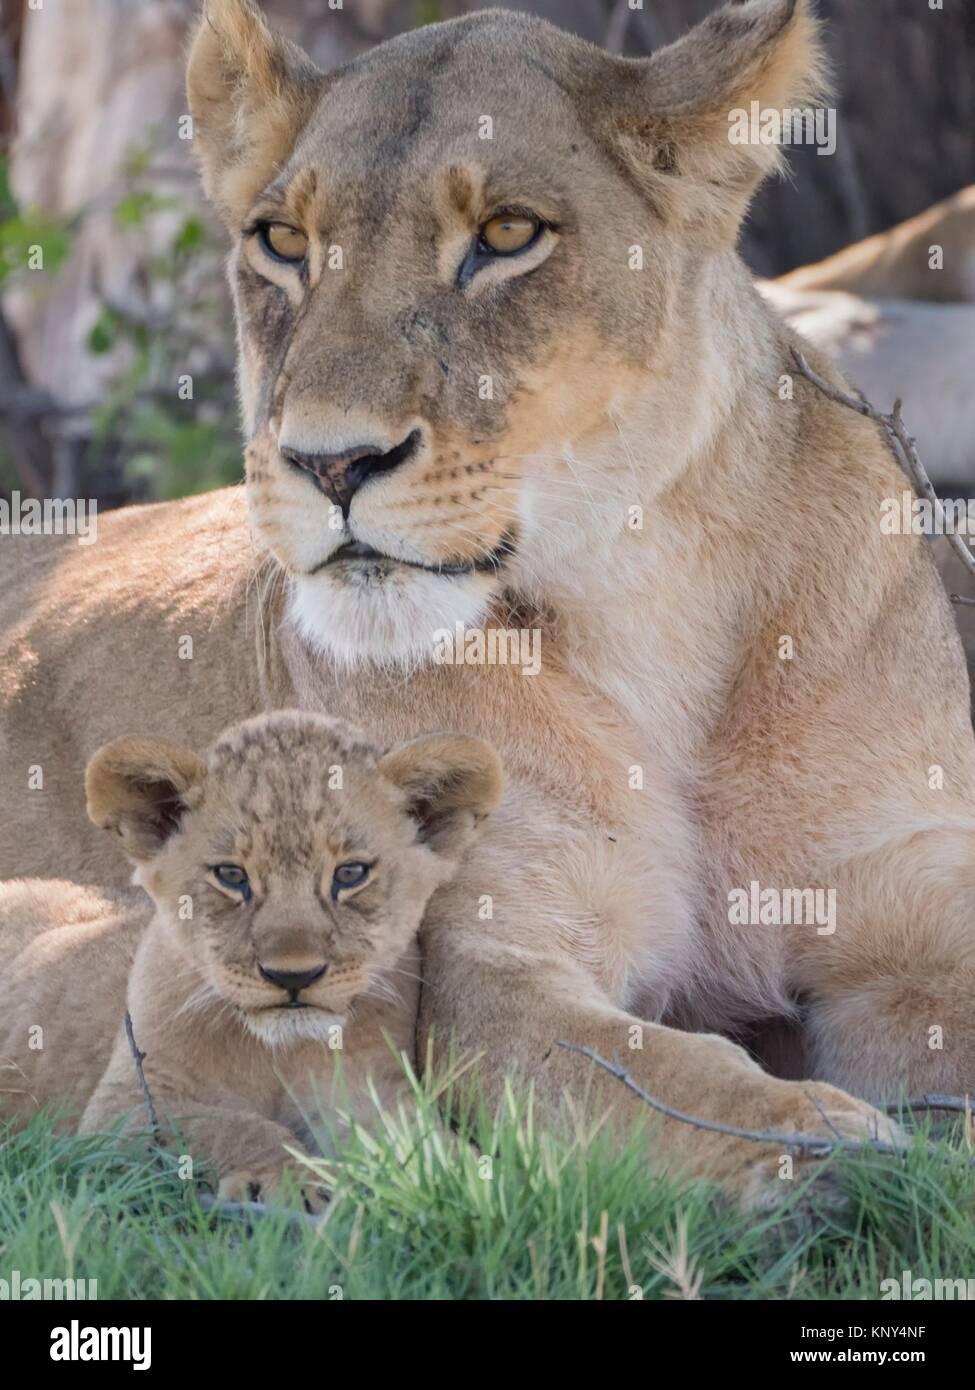 Botswana. Lioness and Baby. - Stock Image